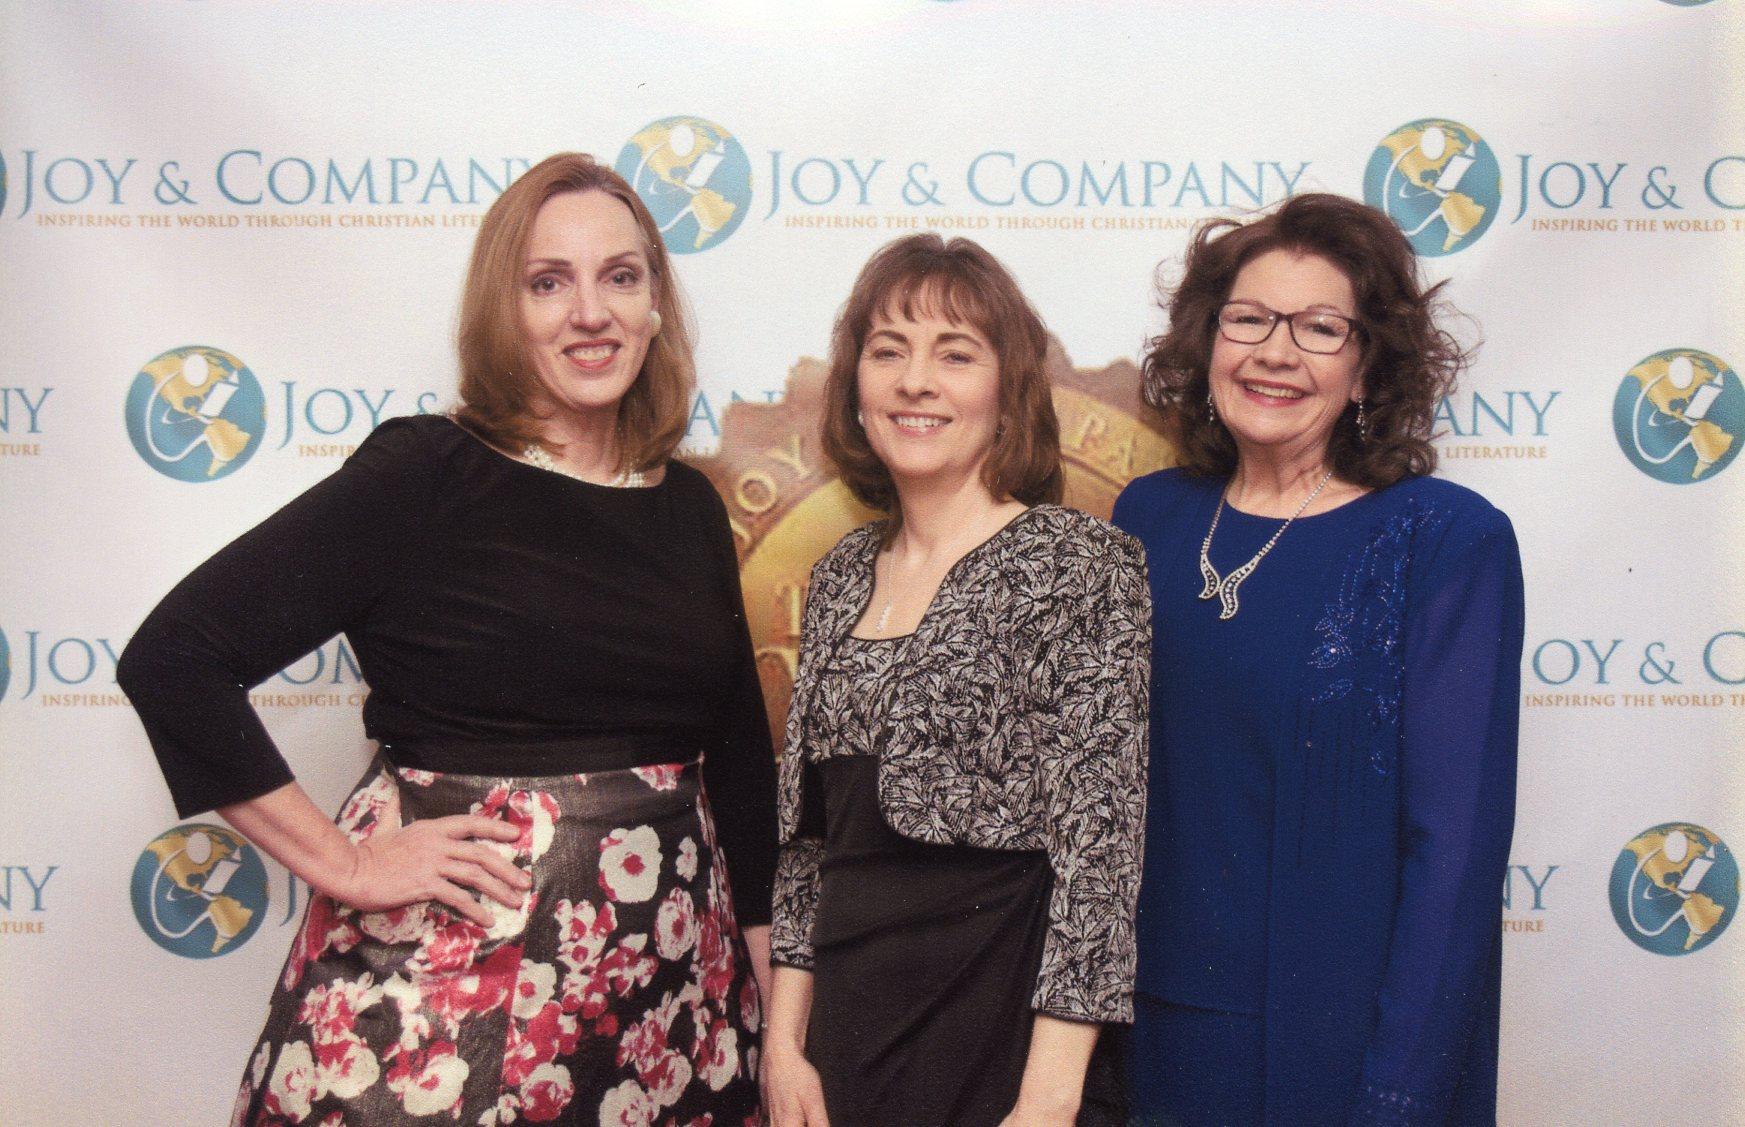 2018 Christian Literary Award gala